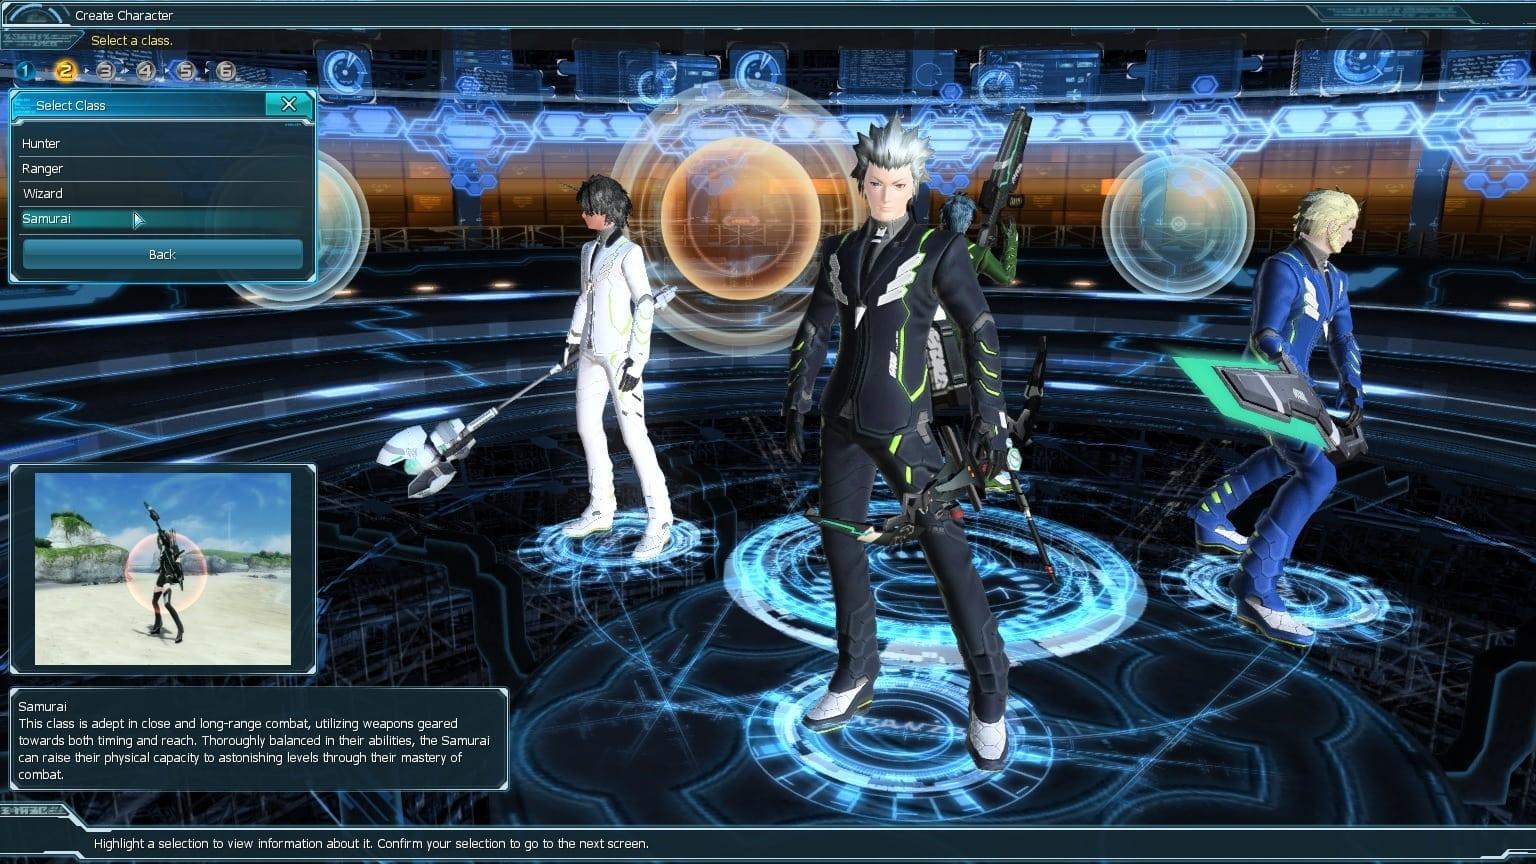 Phantasy Star Online 2 - Samurai class